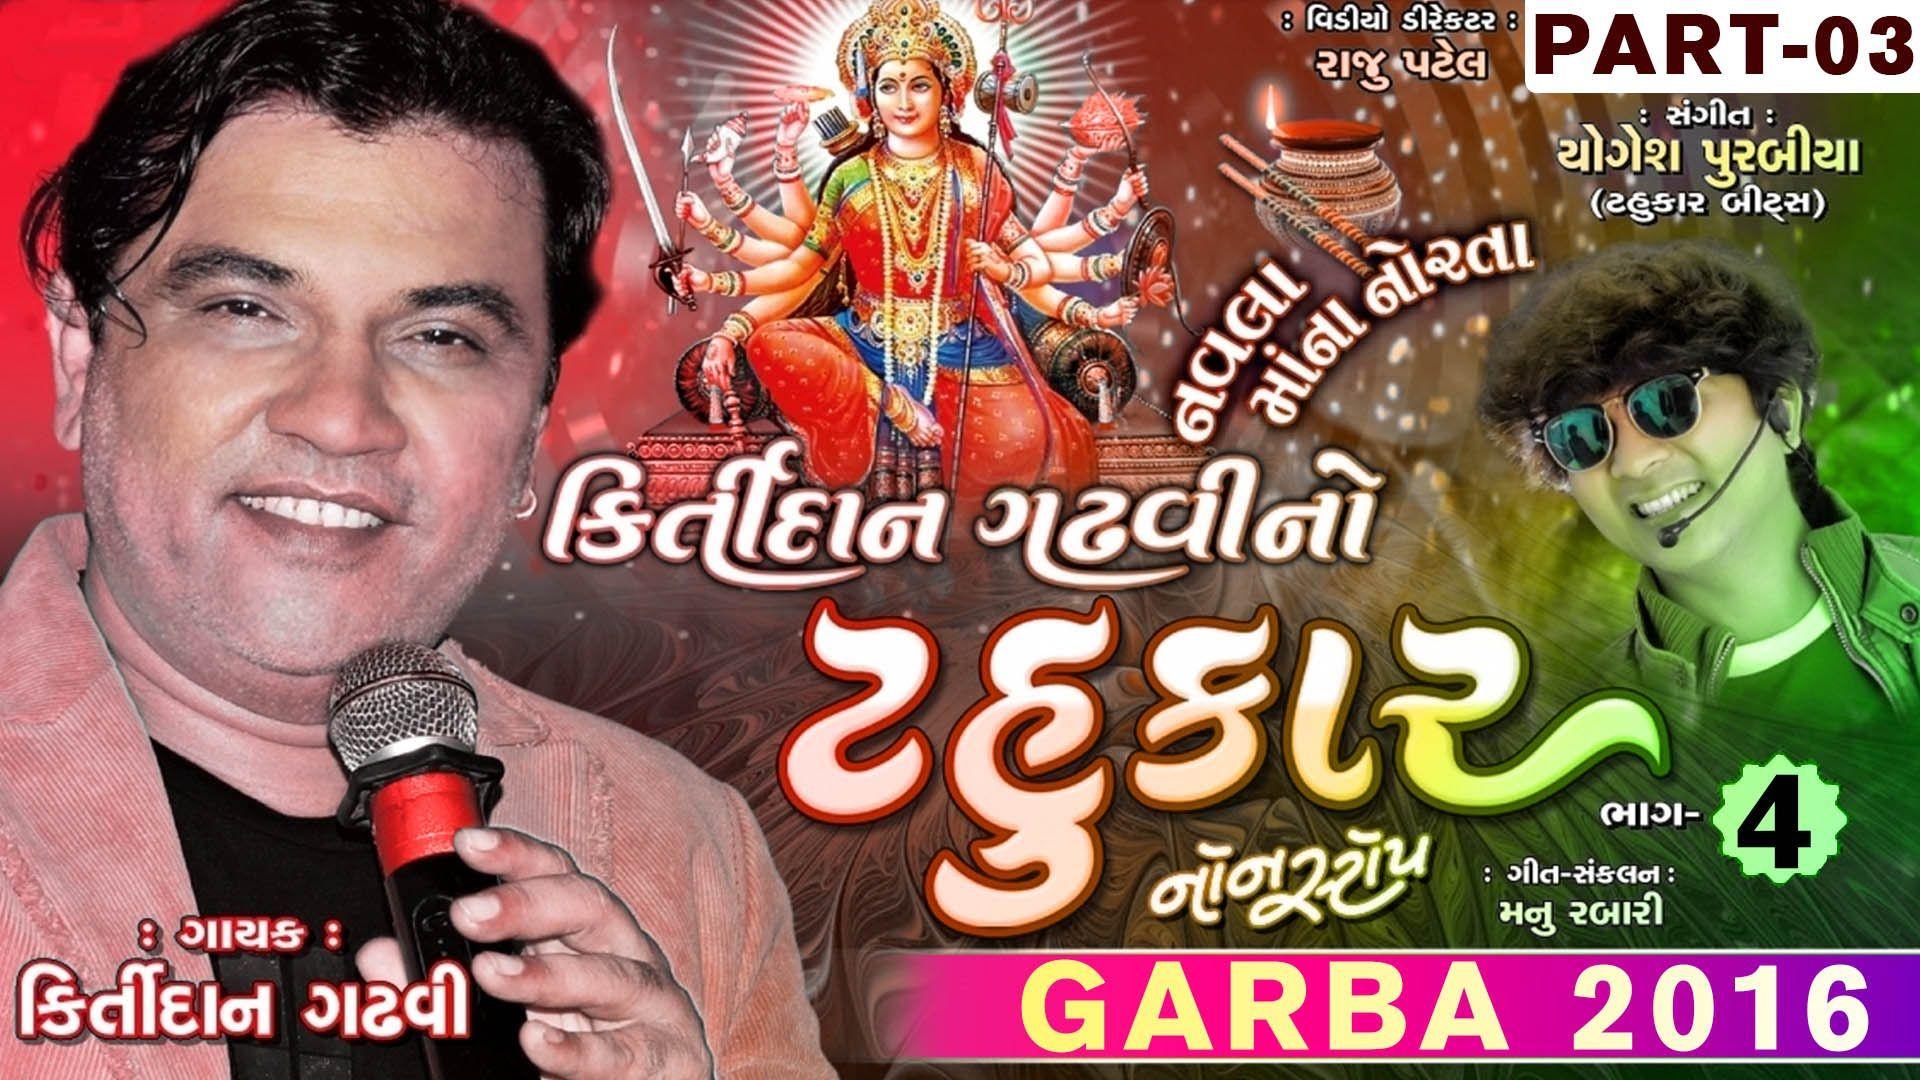 Kirtidan Gadhvi No Tahukar 4 Part 3 Kirtidan Gadhvi Non Stop Guj Mp3 Song Download Dj Remix Songs Audio Songs